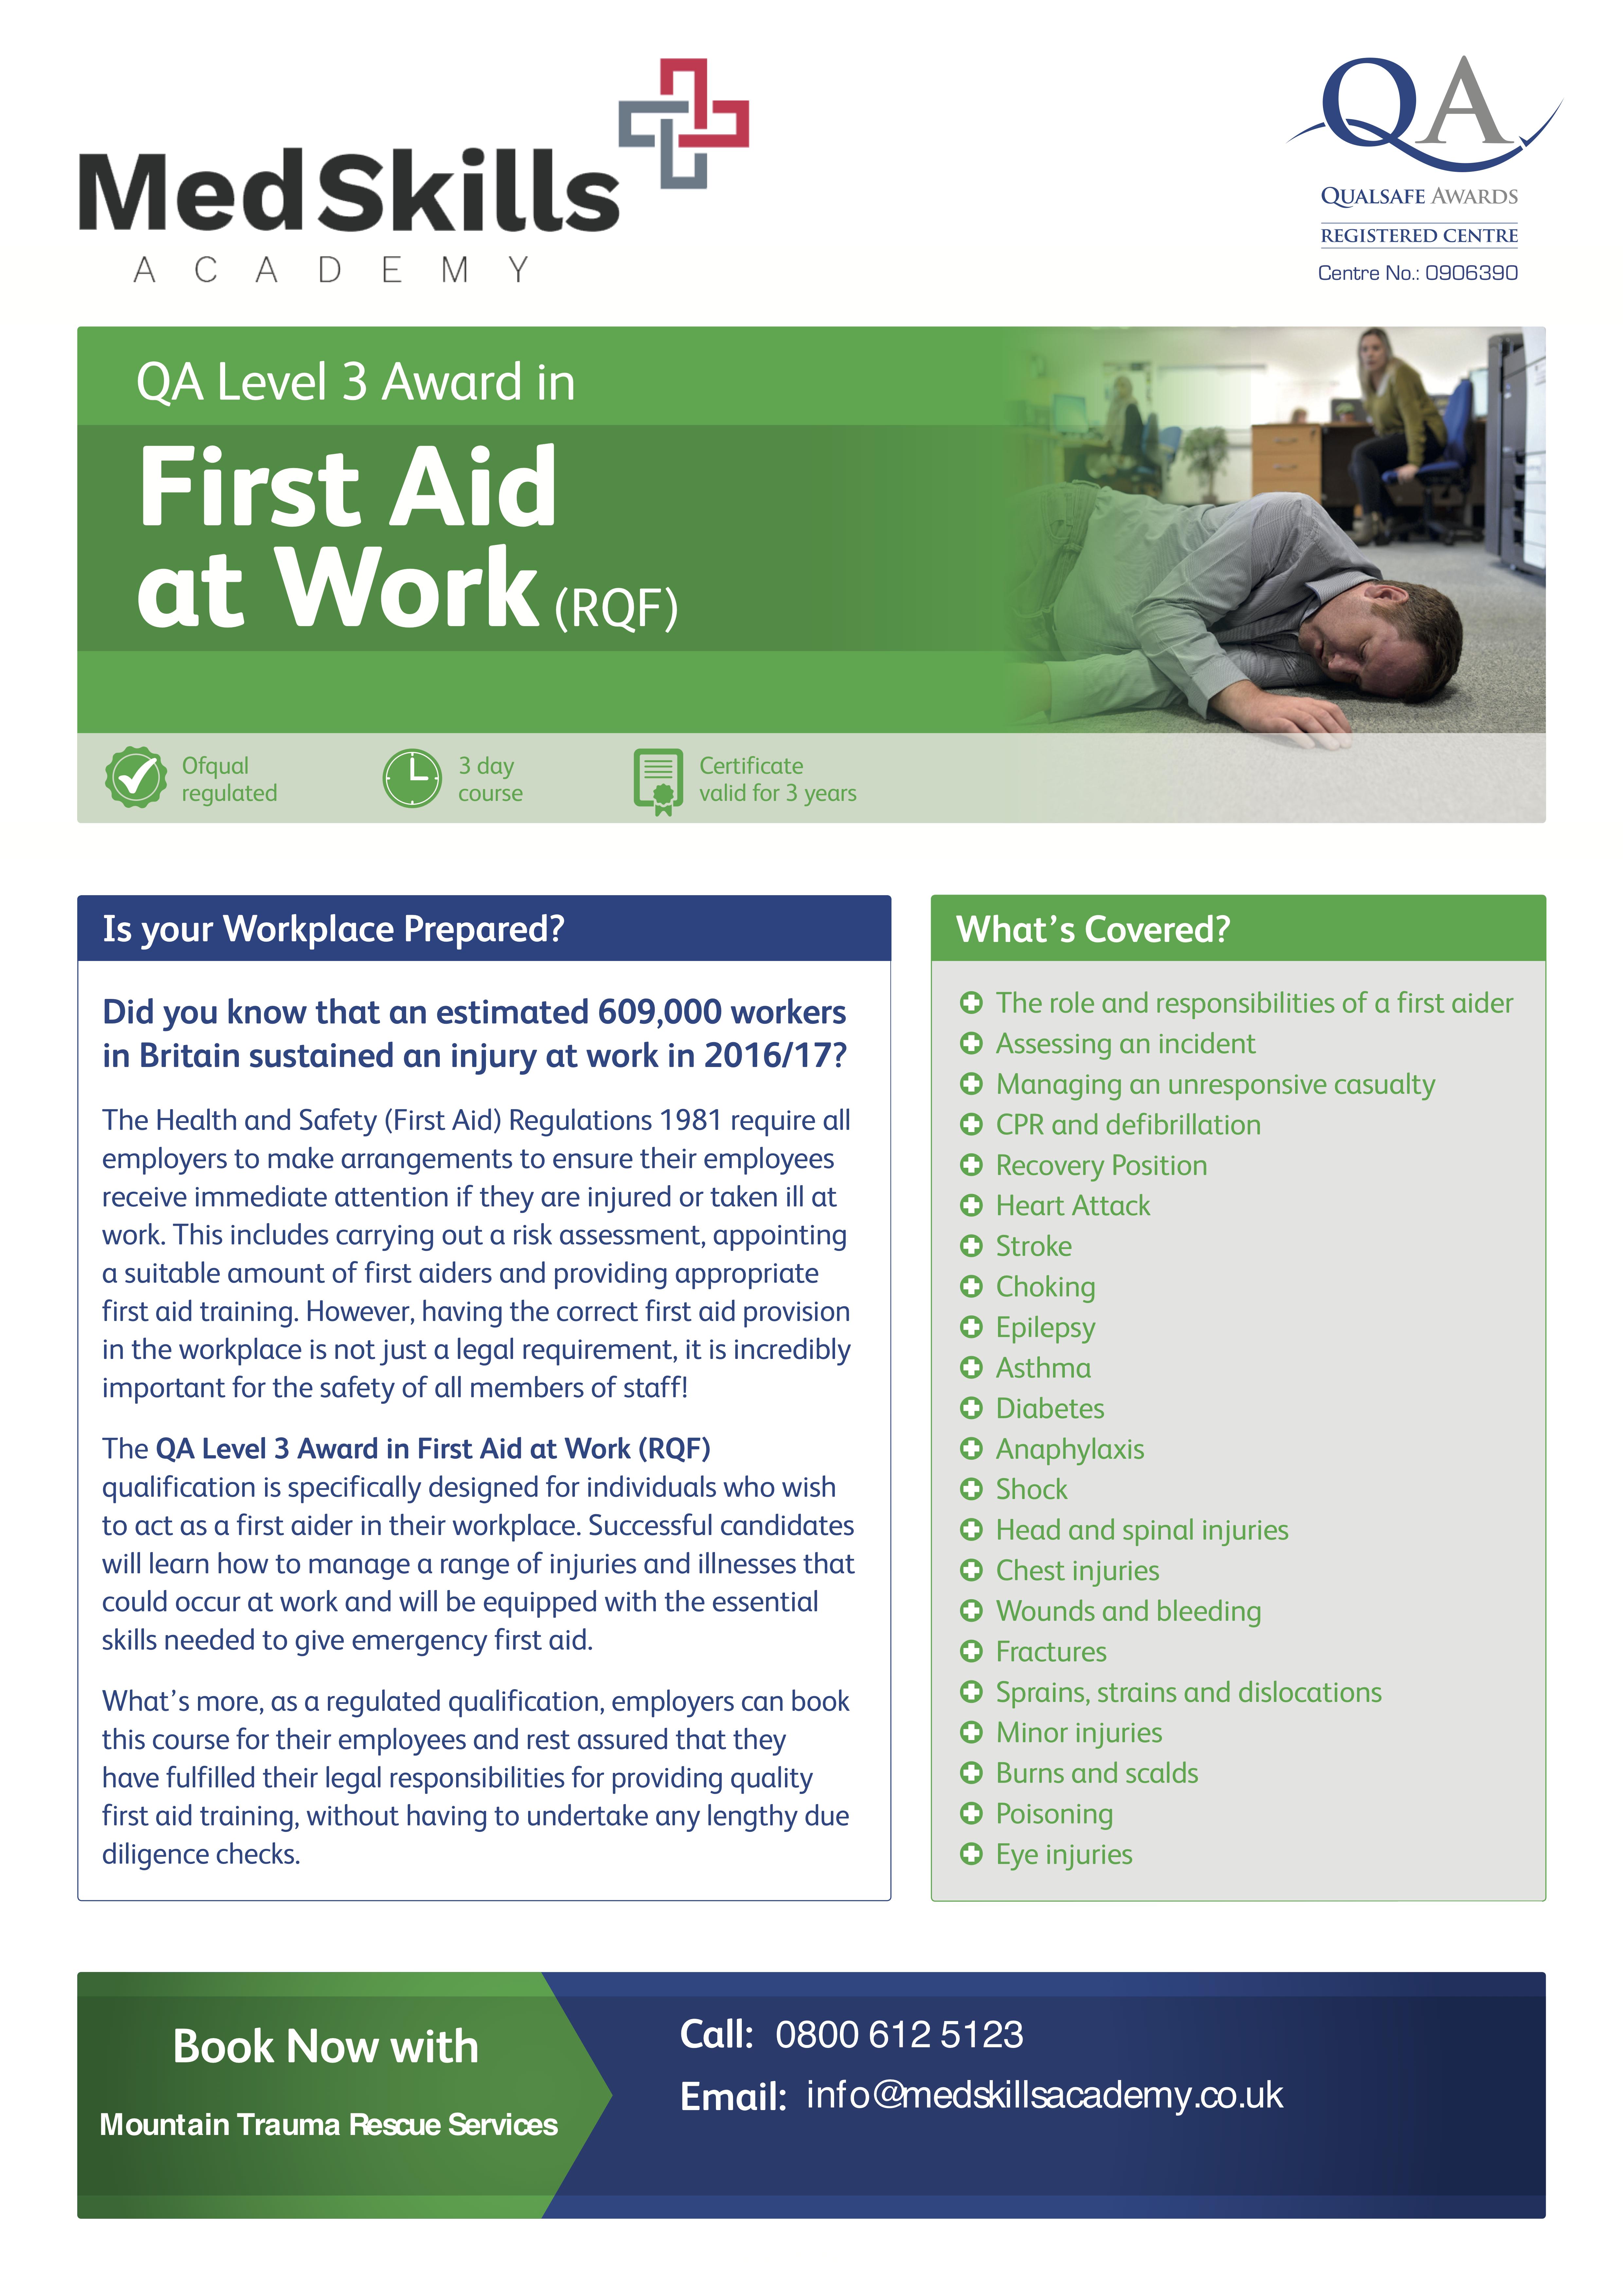 QA_Centre_Marketing_-_First_Aid_at_Work_Flyer